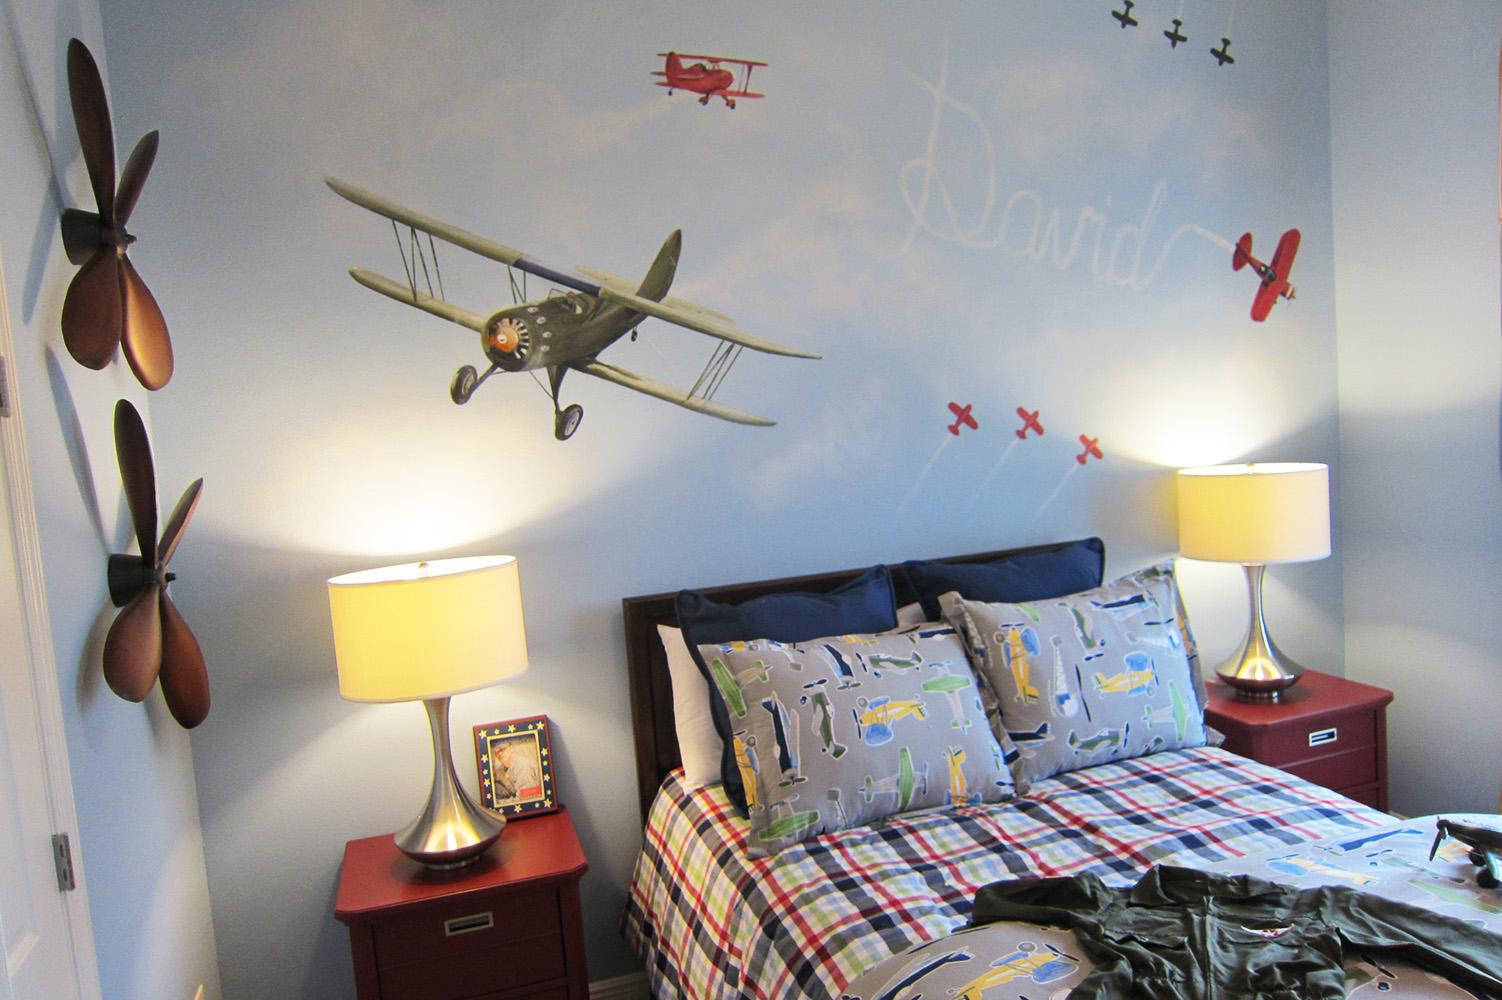 custom murals in tampa and st petersburg splat paint mural in model home